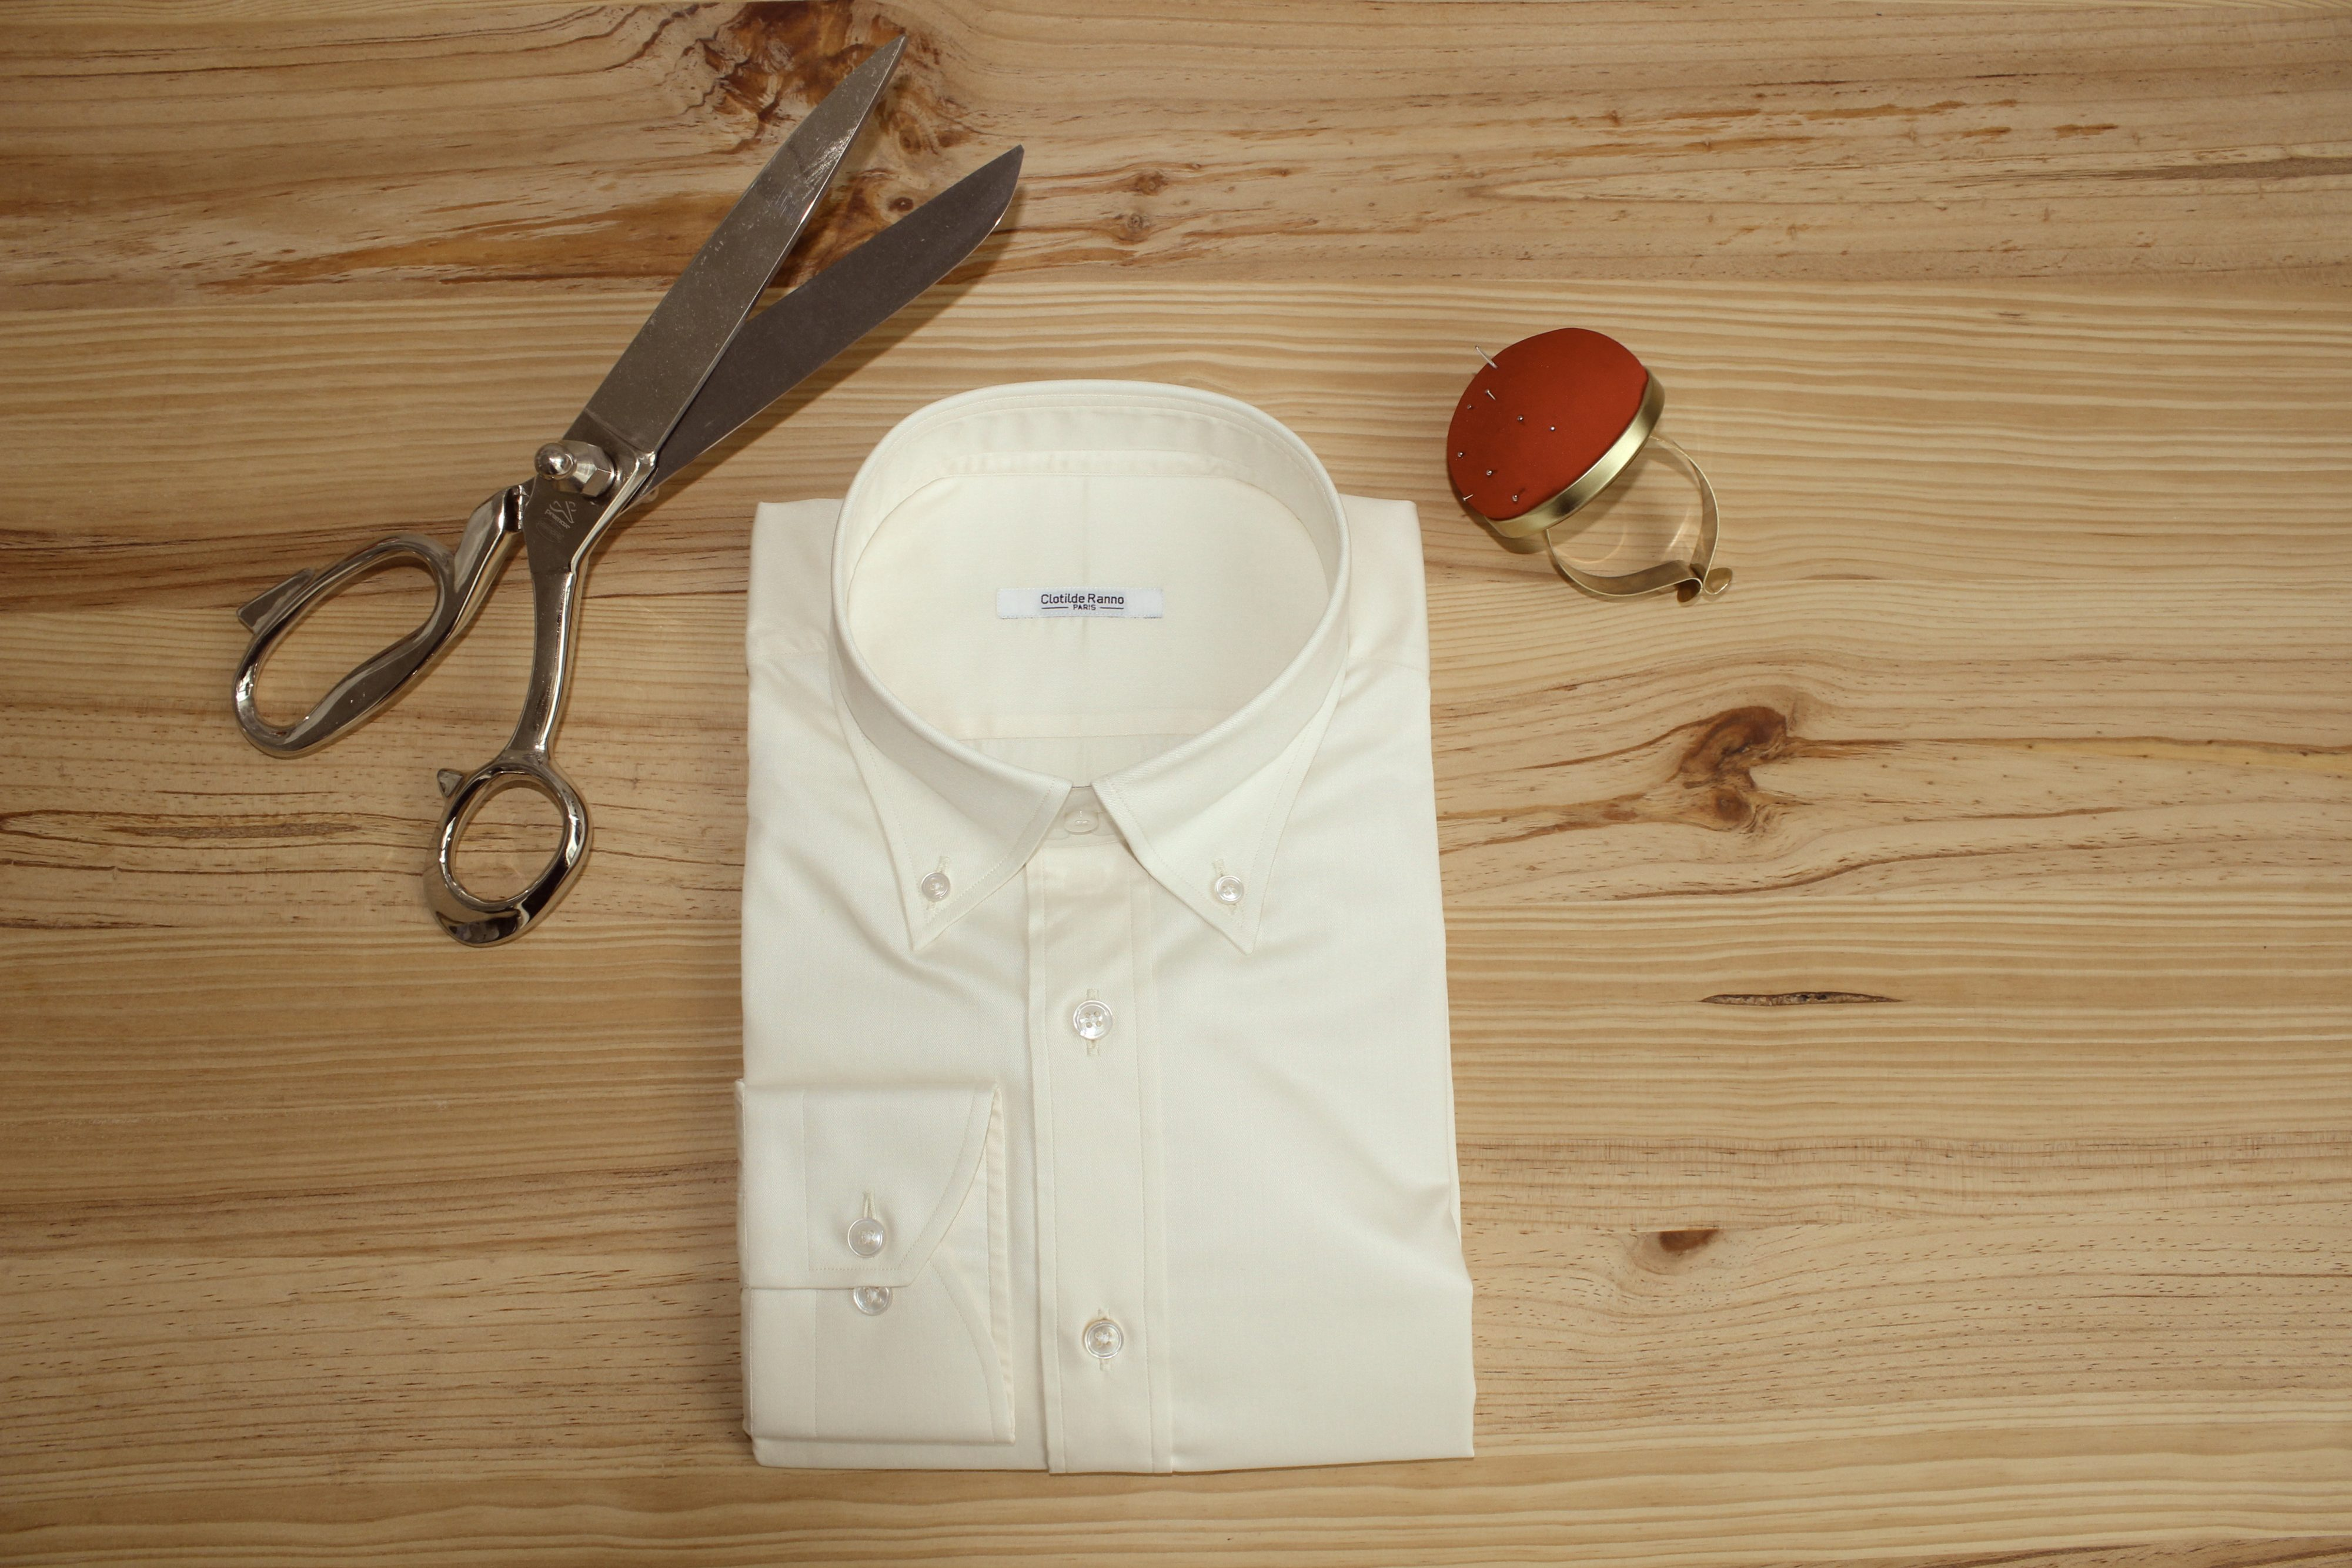 chemise sur mesure beige non iron , chemise beige sur mesure , chemise beige non iron , chemise sur mesure non iron